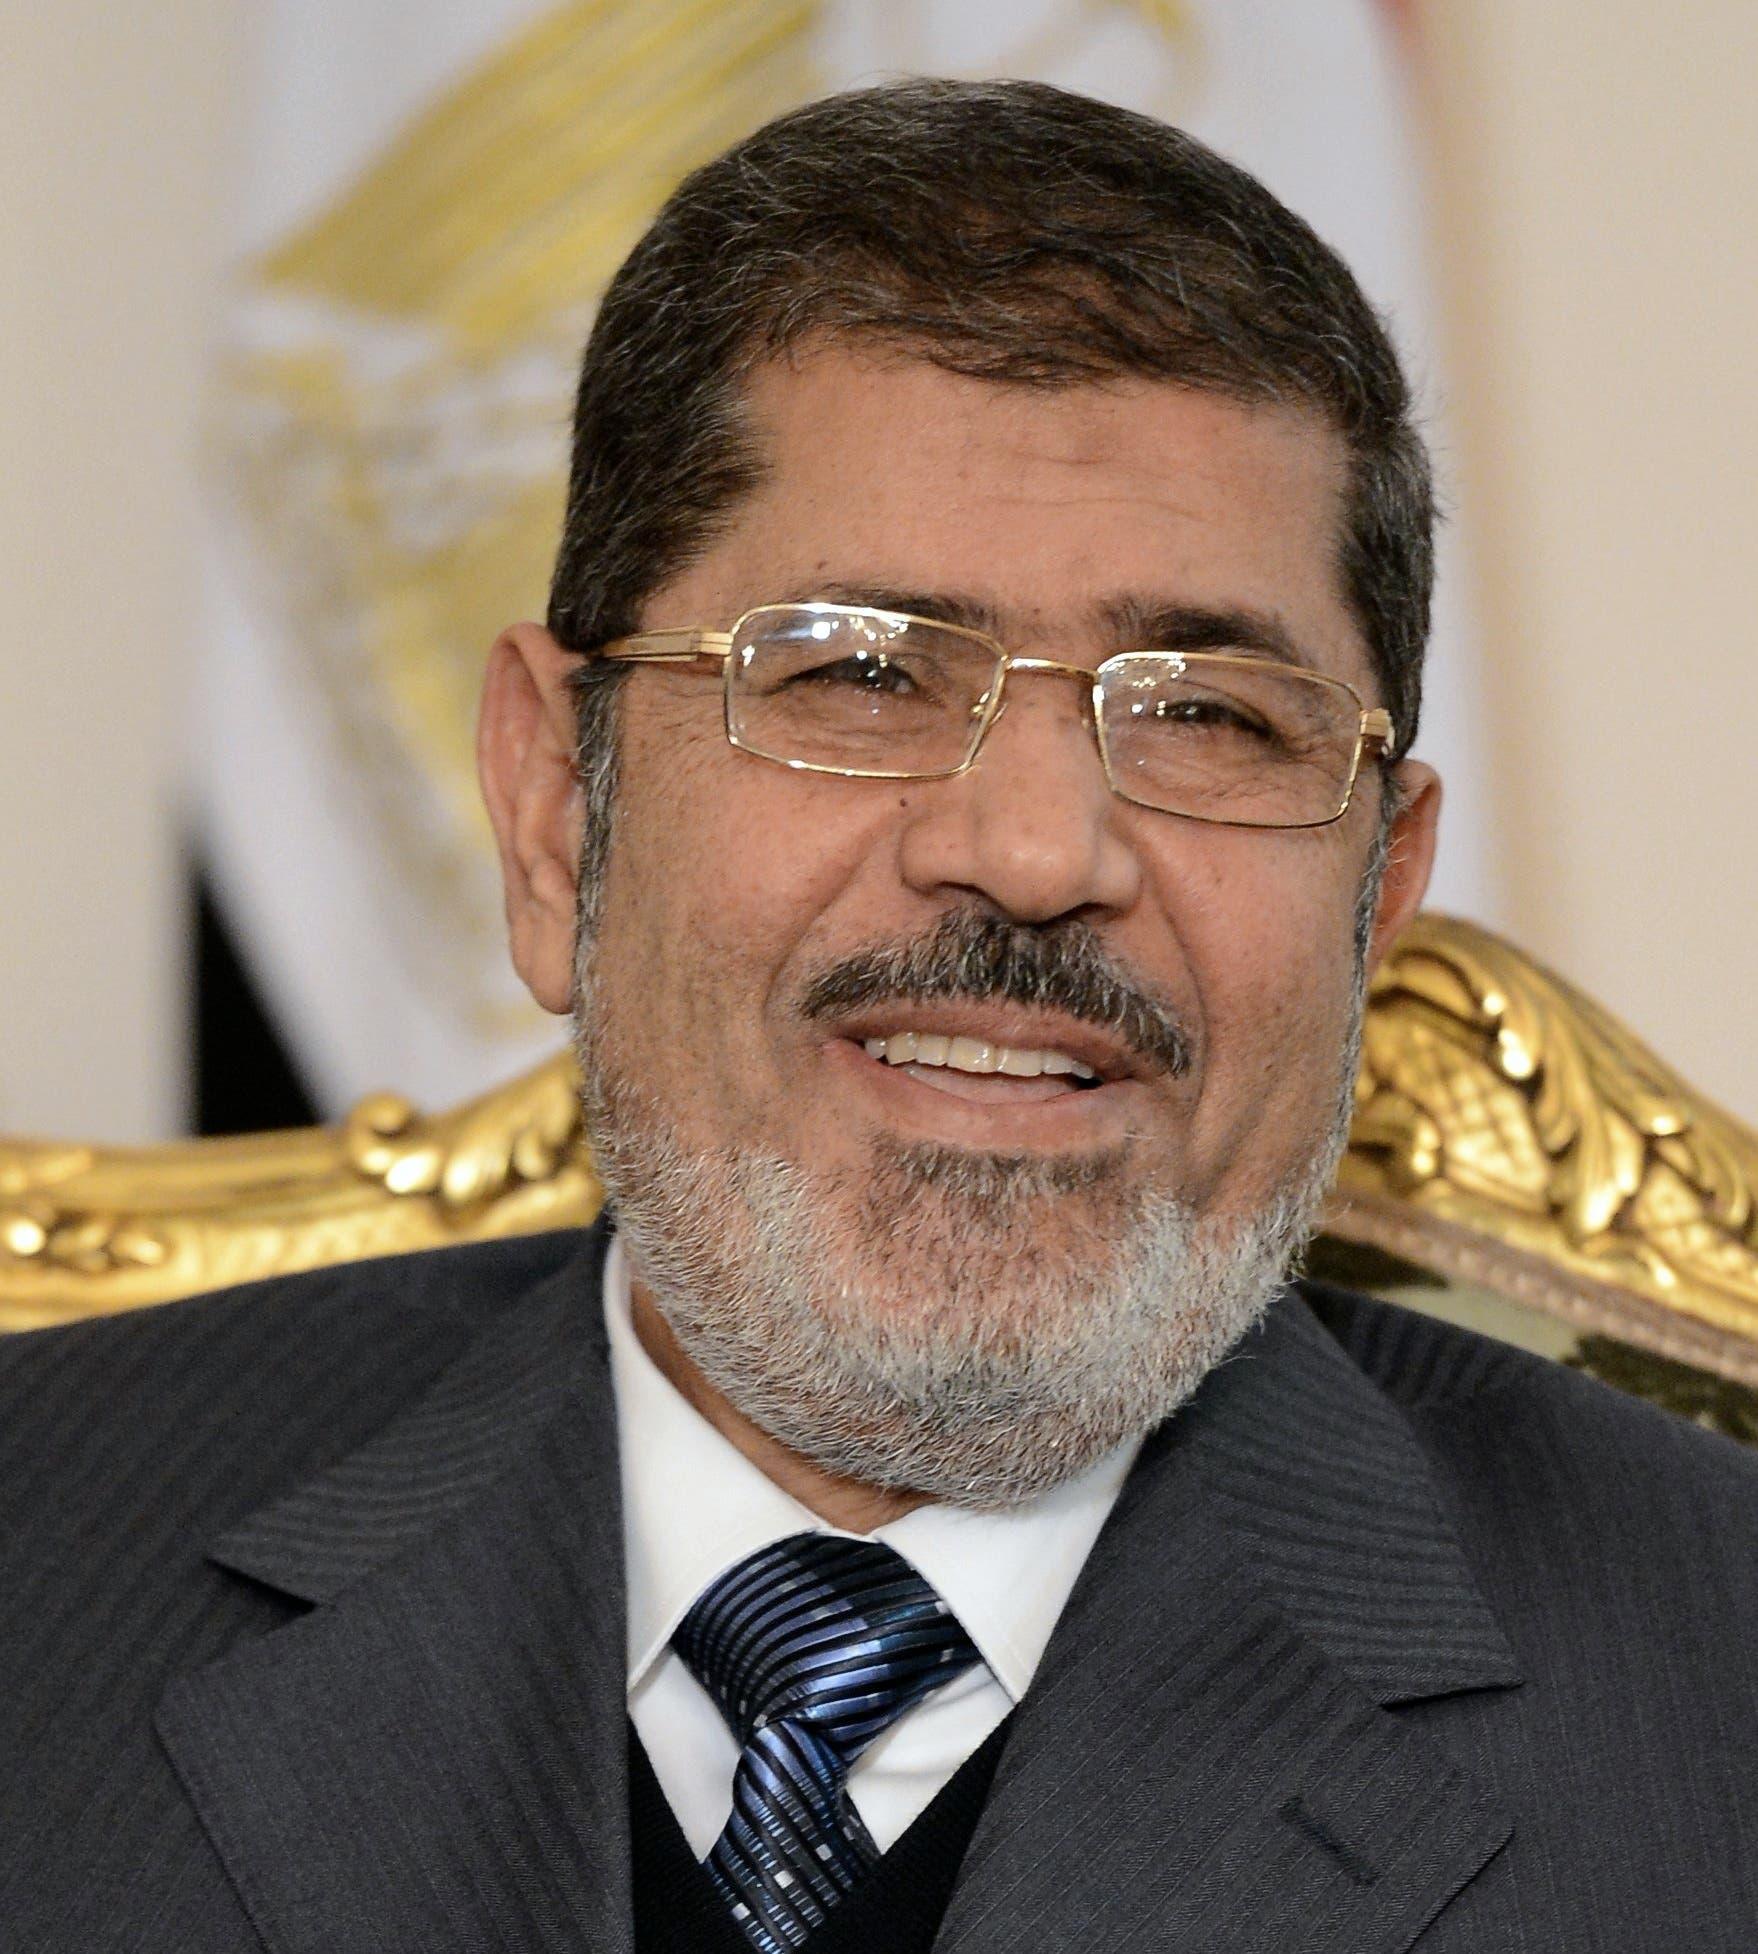 President Mohamed Morsi (Photo courtesy of Khaled Desouki / AFP)